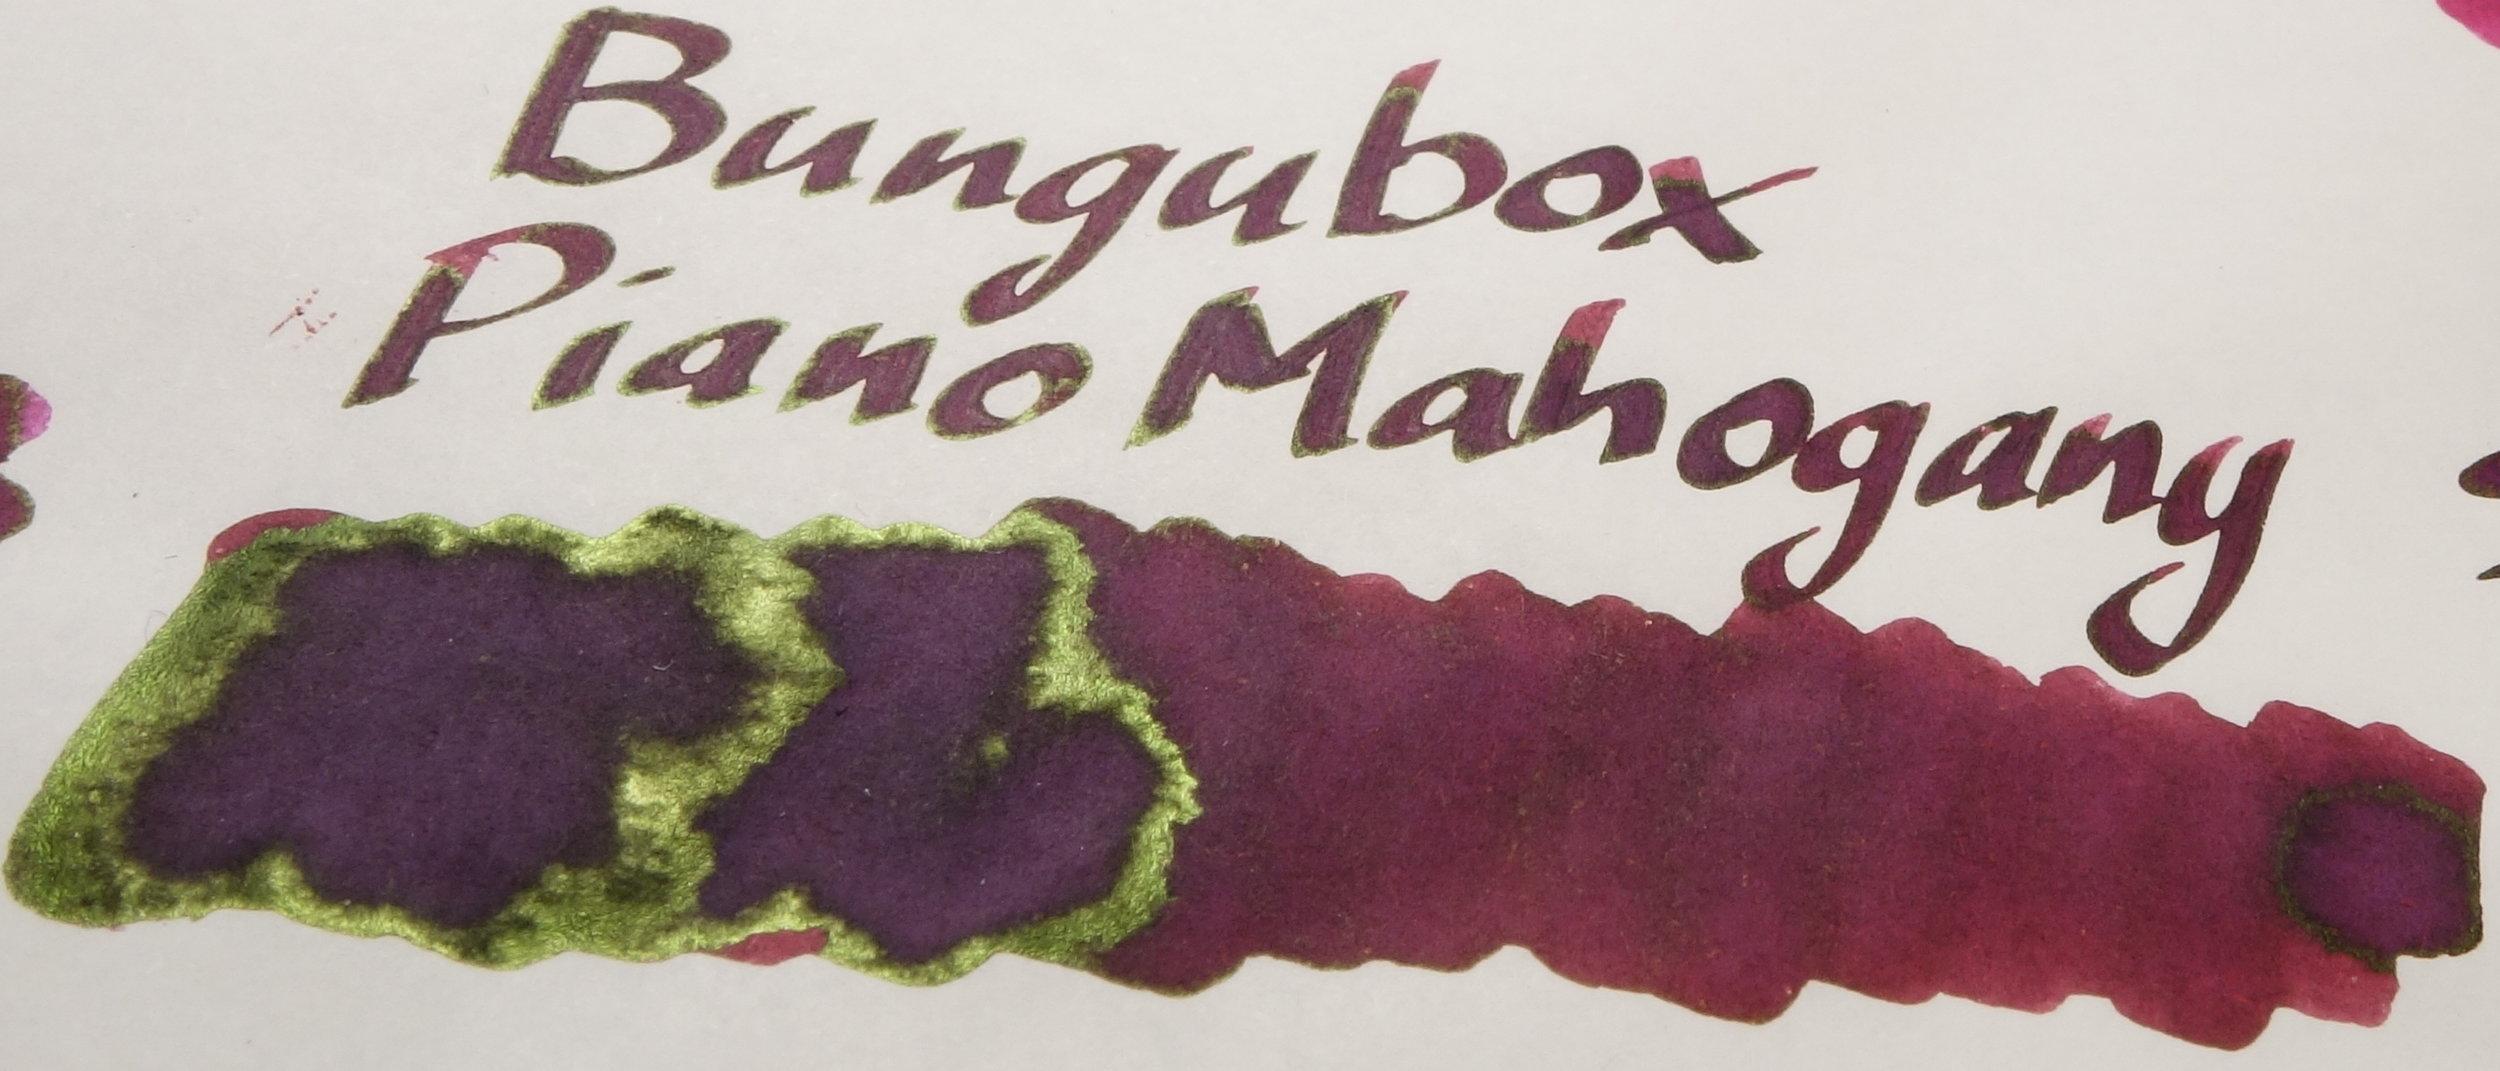 Sheen Bungubox Piano Mahogany.JPG